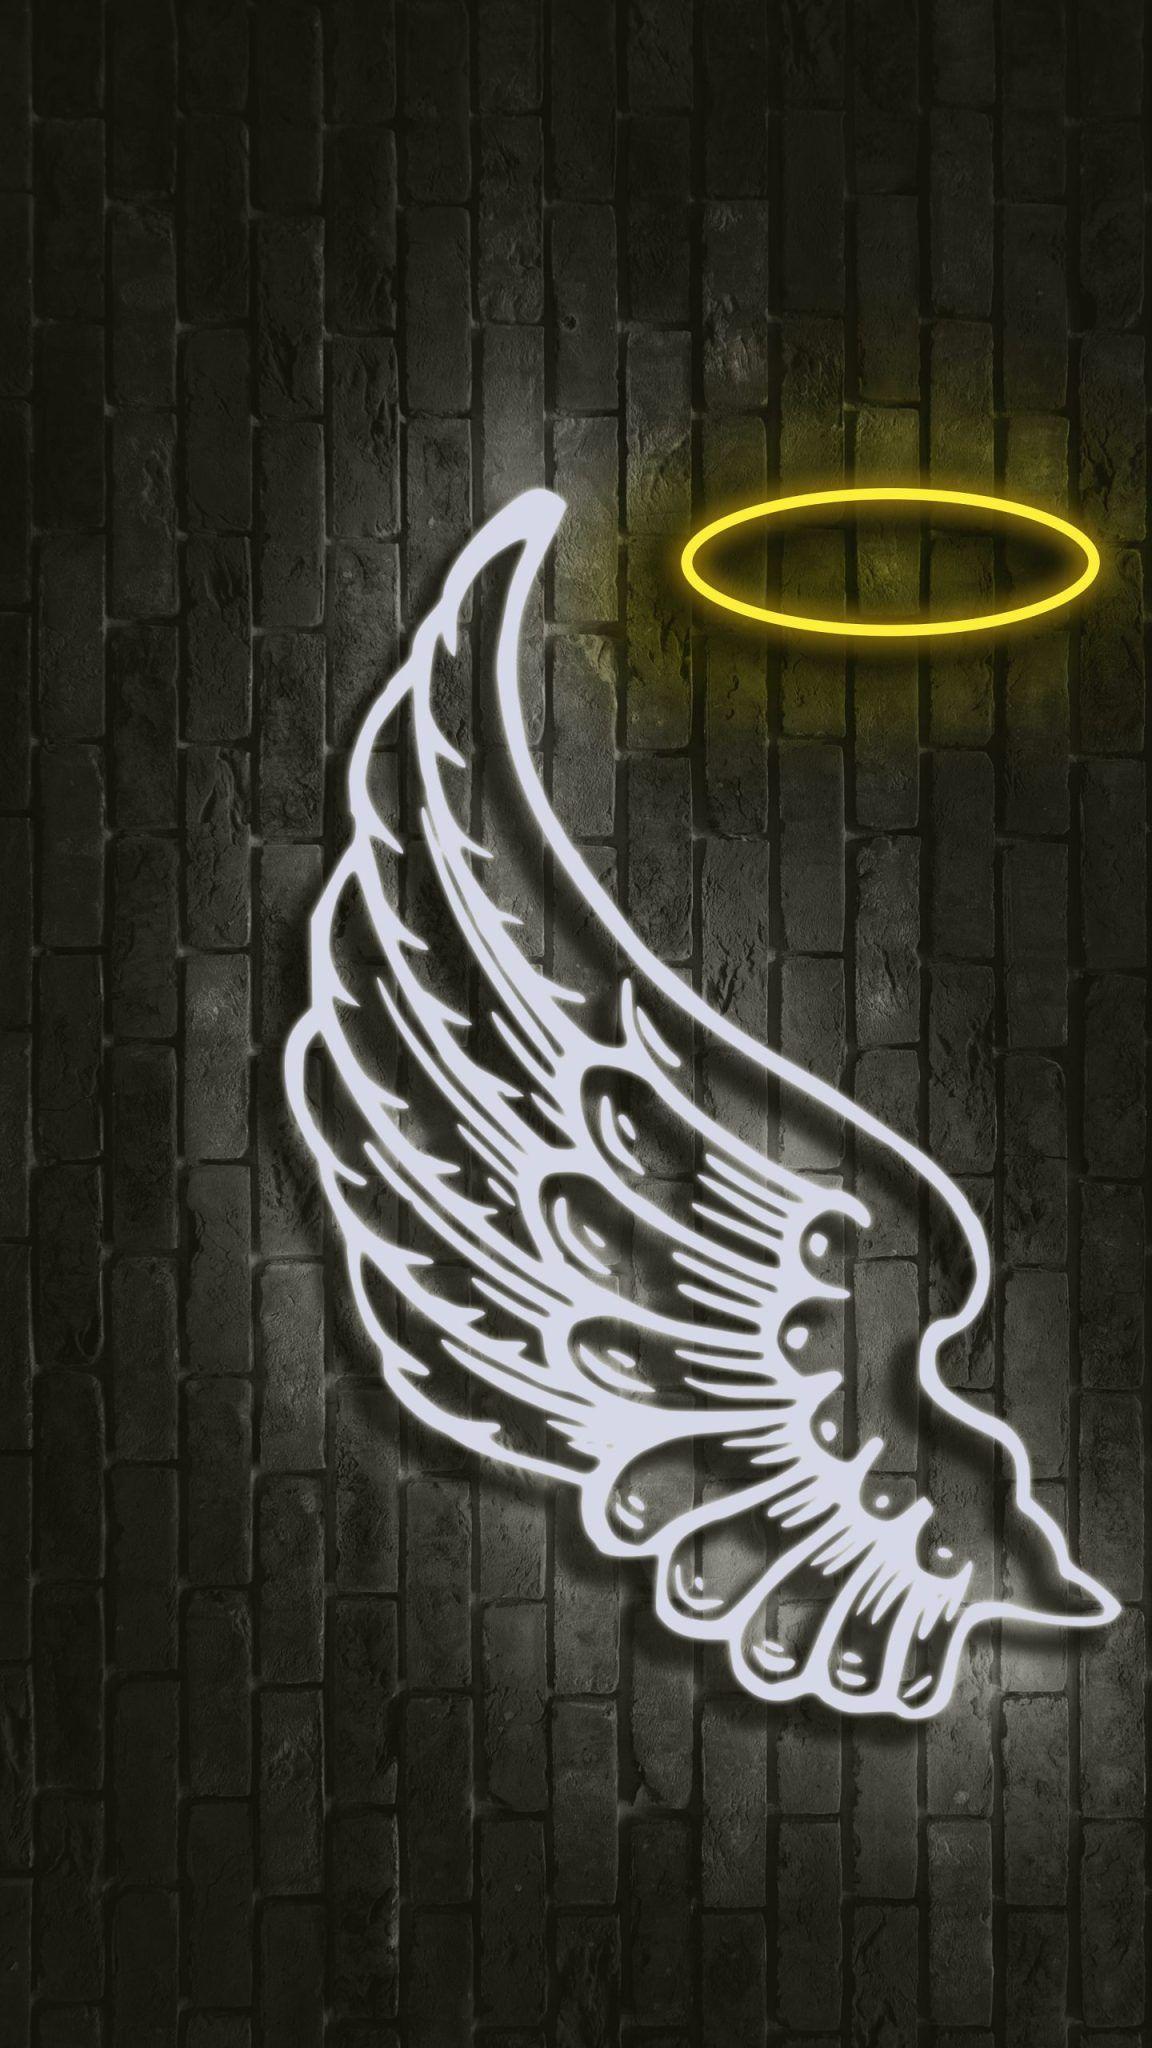 Amoled Archives Page 2 Of 25 Traxzee Wings Wallpaper Dark Wallpaper Iphone Angel Wallpaper Aesthetic iphone angel wings wallpaper